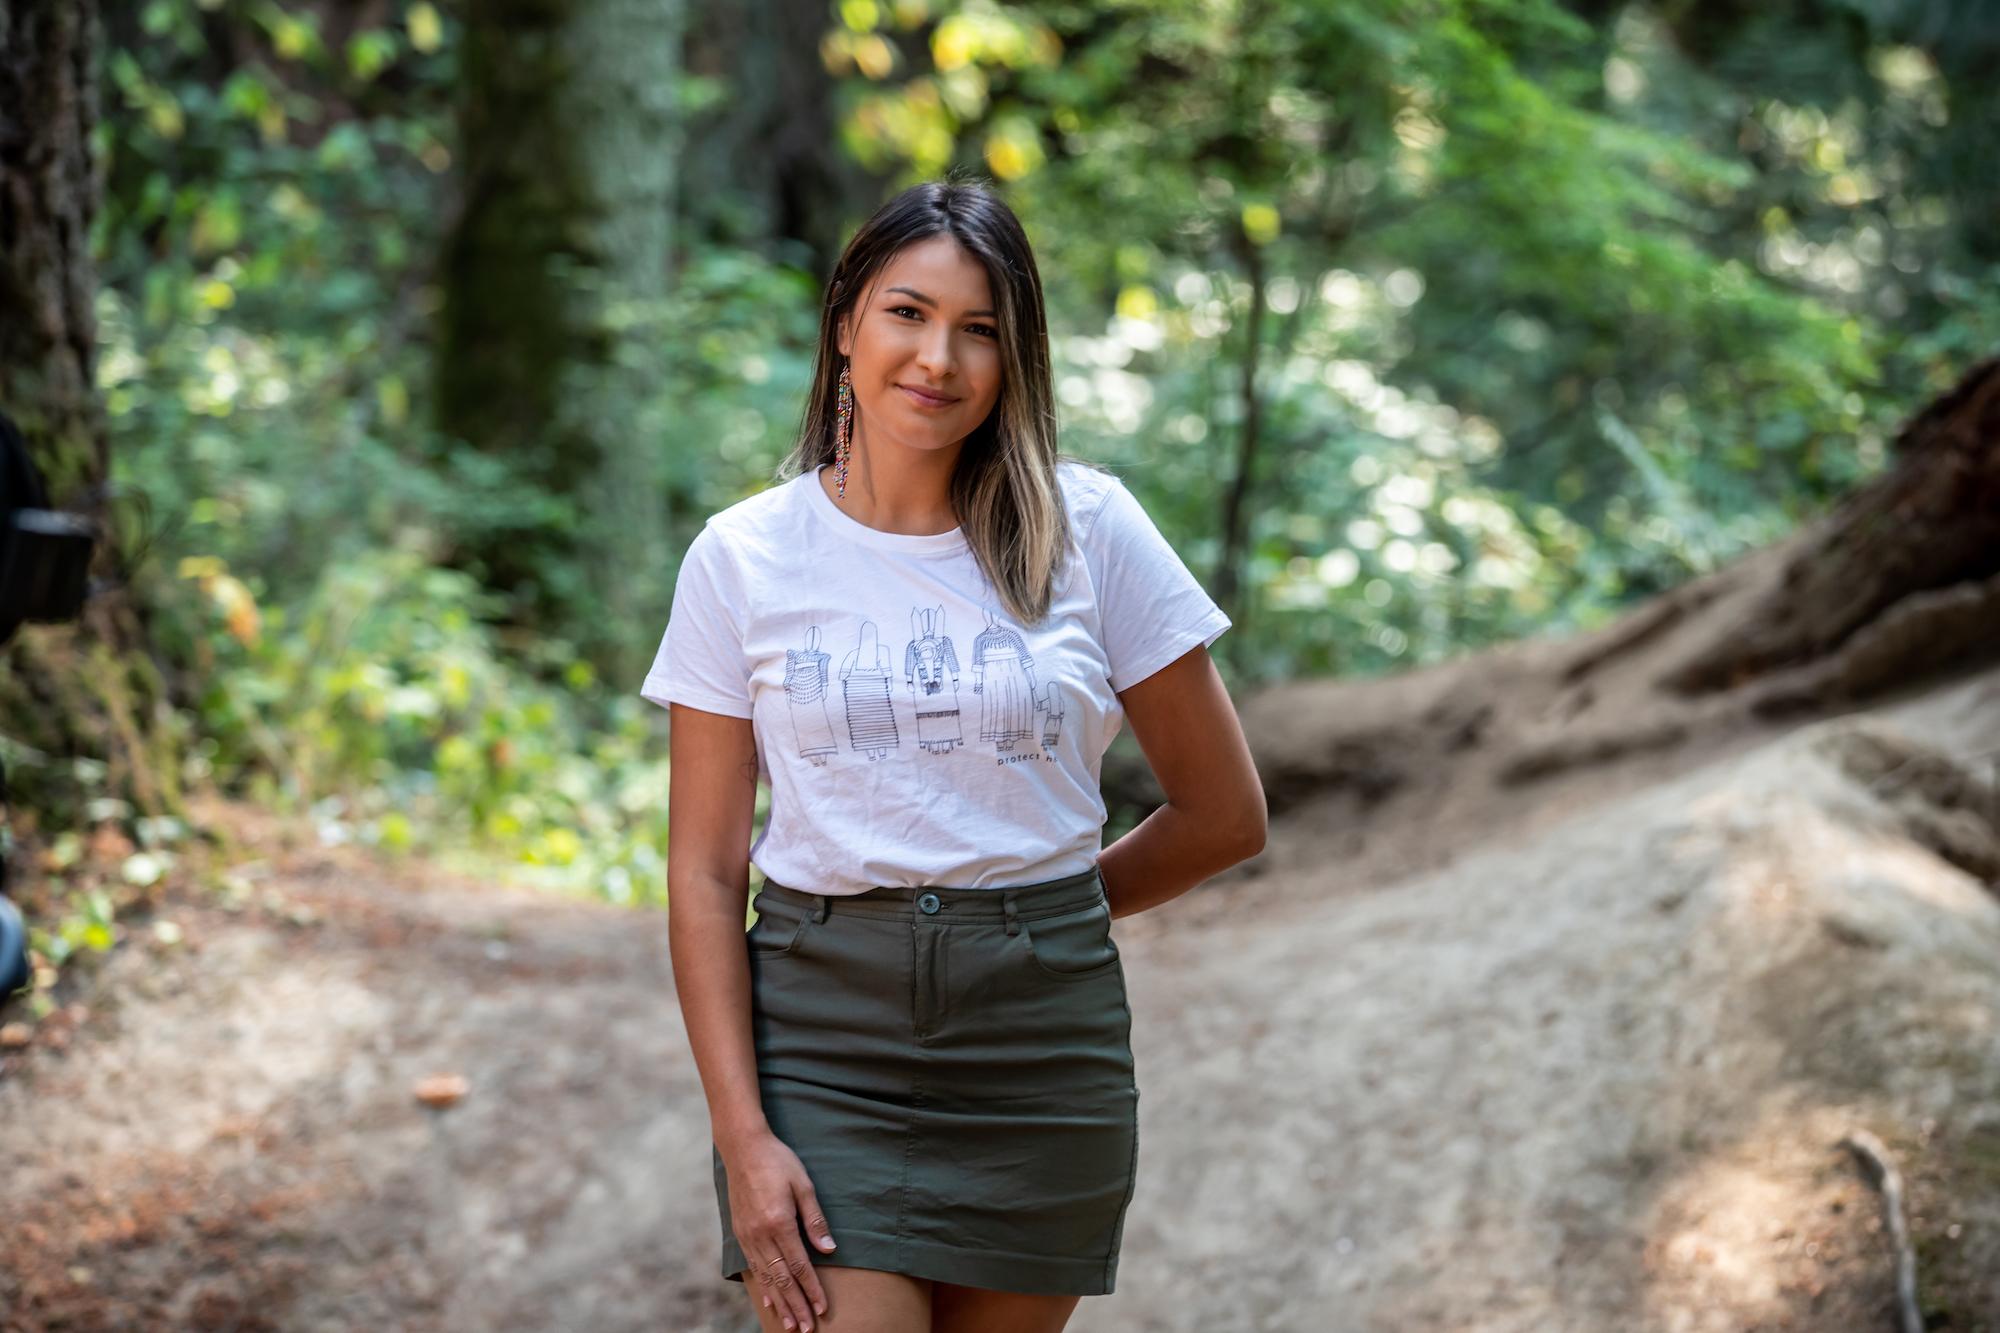 Trailblazing initiative looks to empower Indigenous women investors